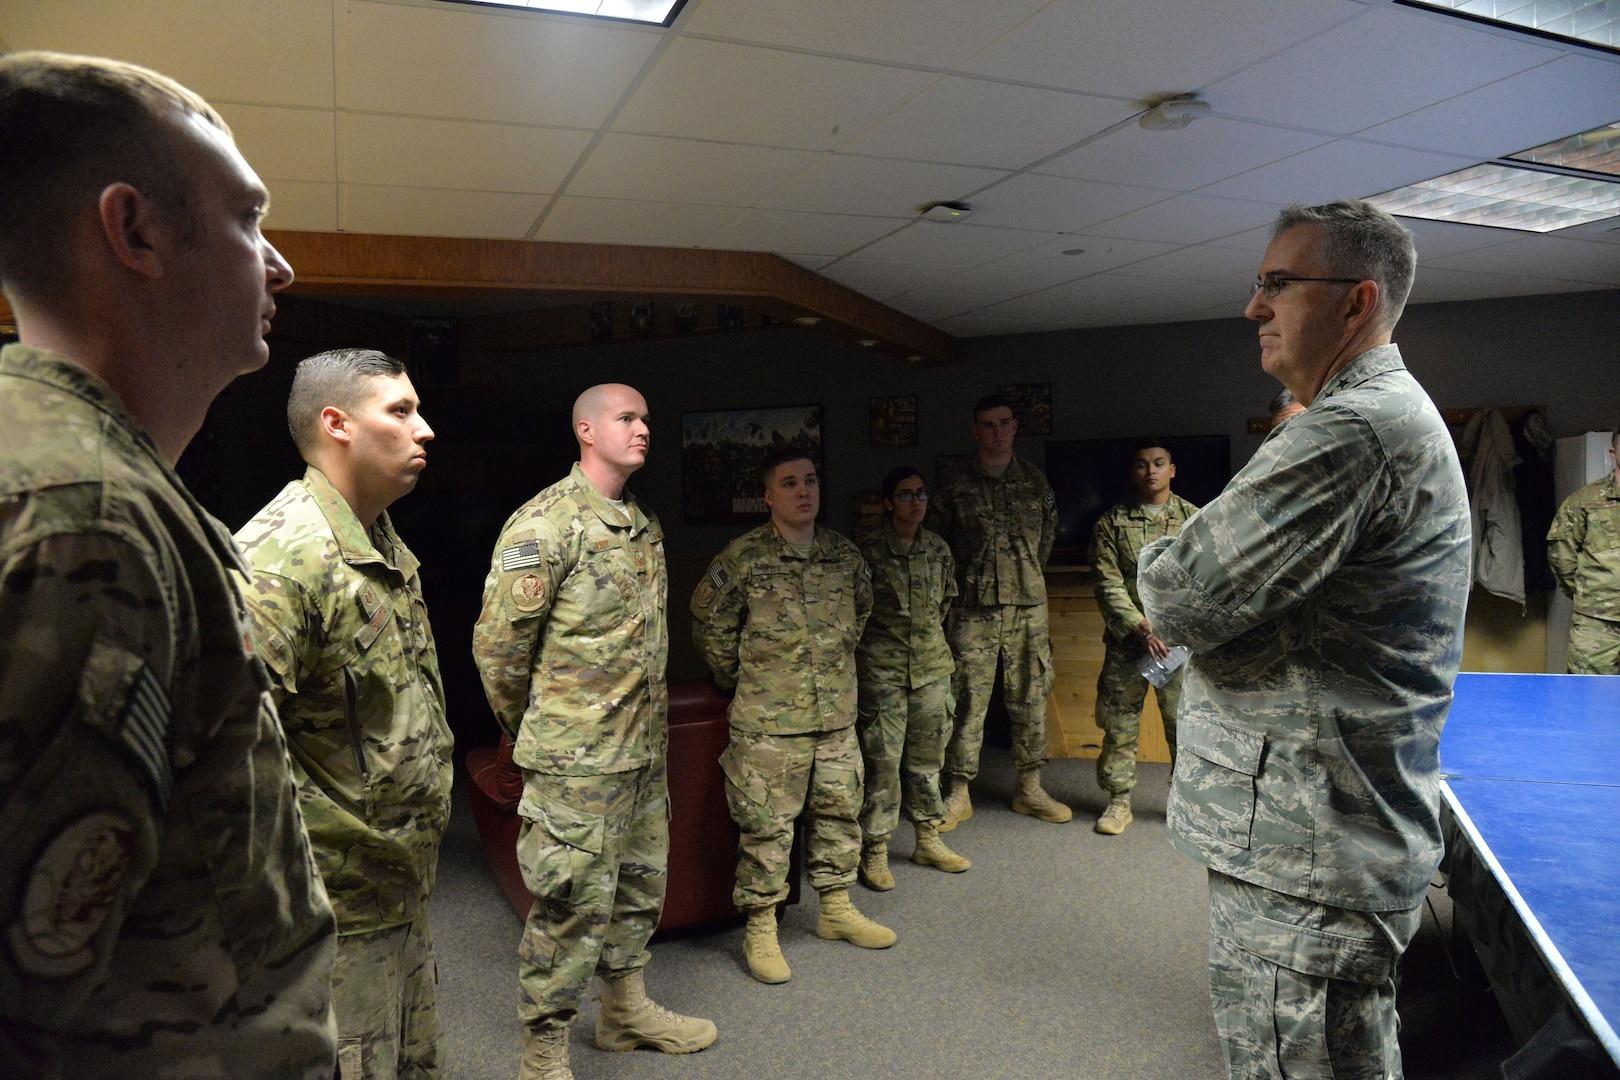 U.S. Air Force Gen. John Hyten, commander of U.S. Strategic Command (USSTRATCOM), speaks with airmen at a missile alert facility near Simms, Mont., Jan. 16, 2018.